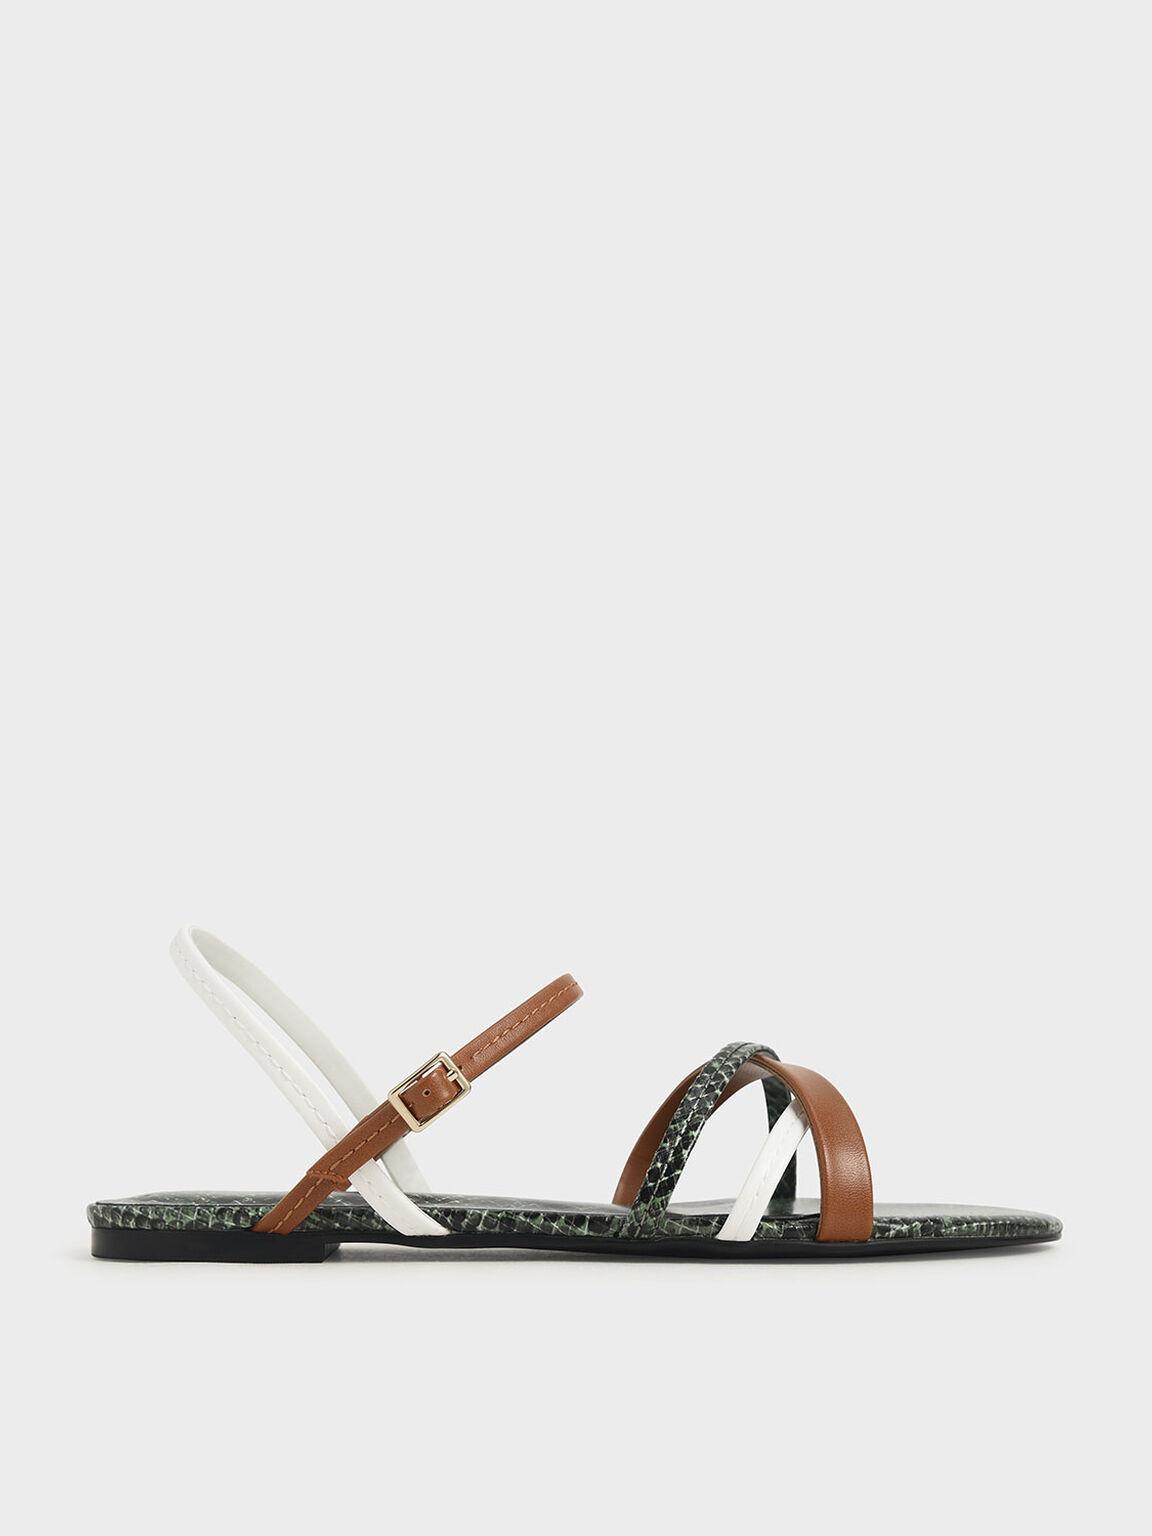 Snake Print Criss-Cross Ankle Strap Flats, Multi, hi-res